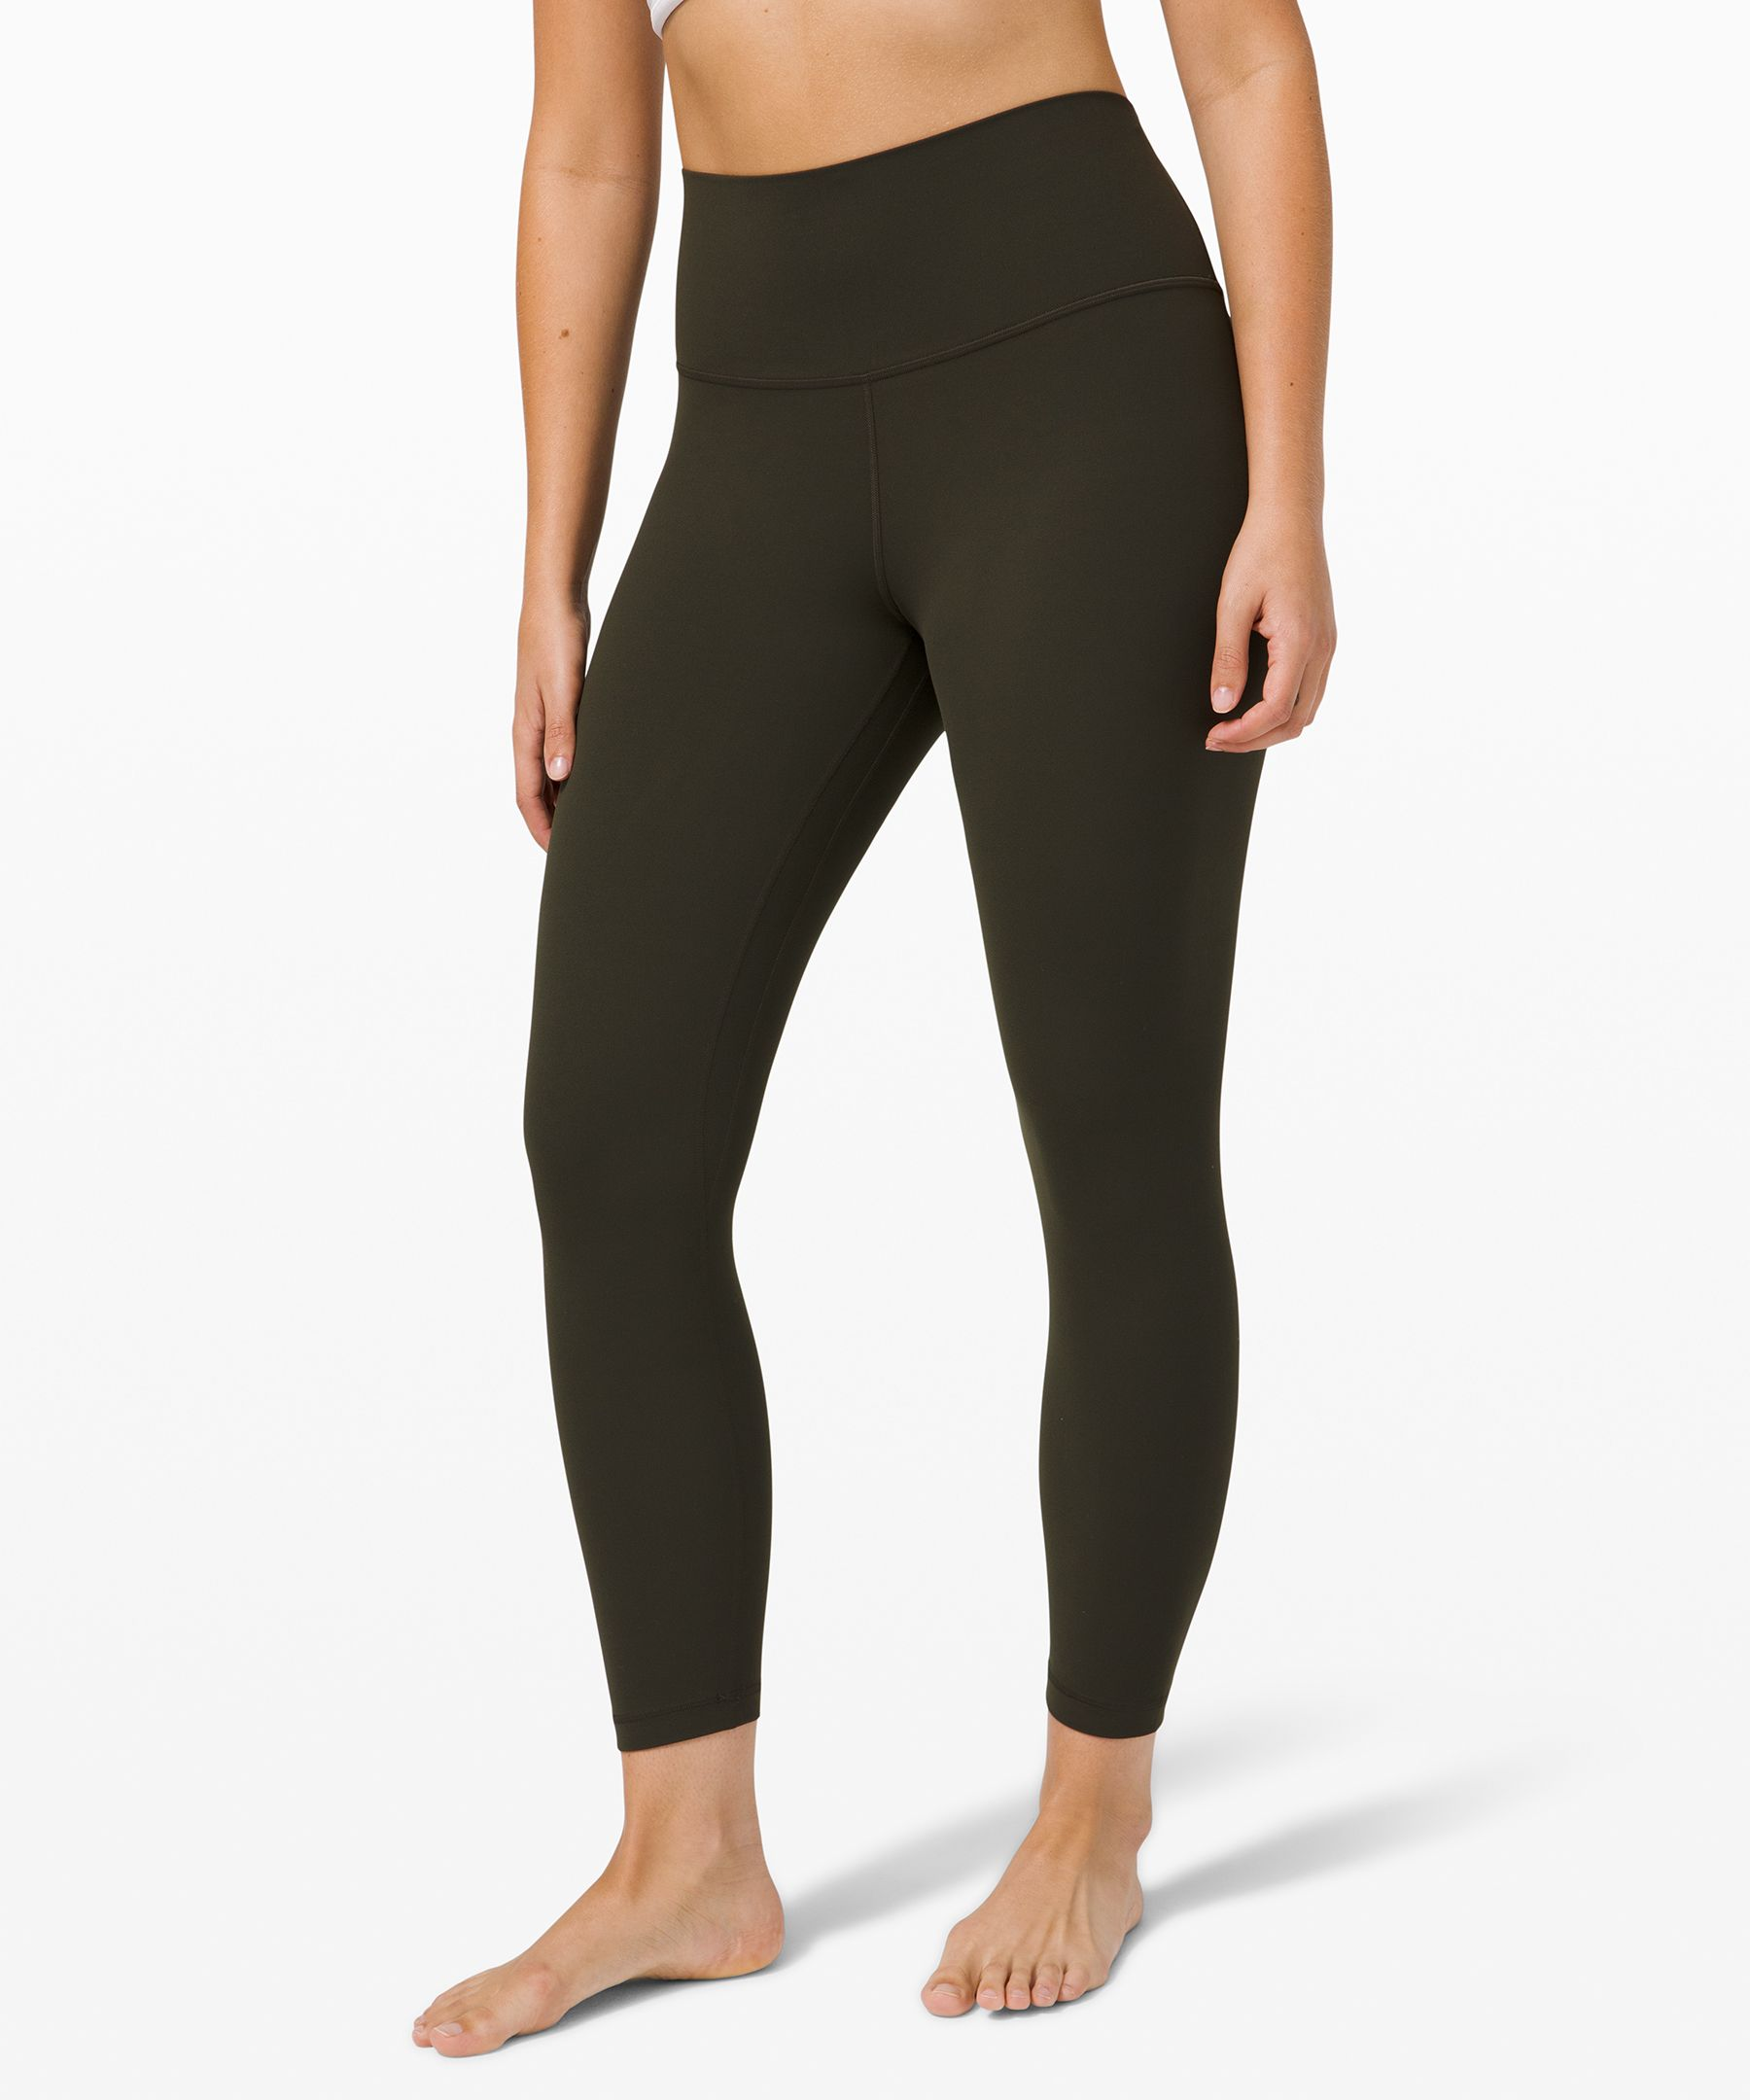 Yoga-Hosen Einkaufen Teen Sister Yoga